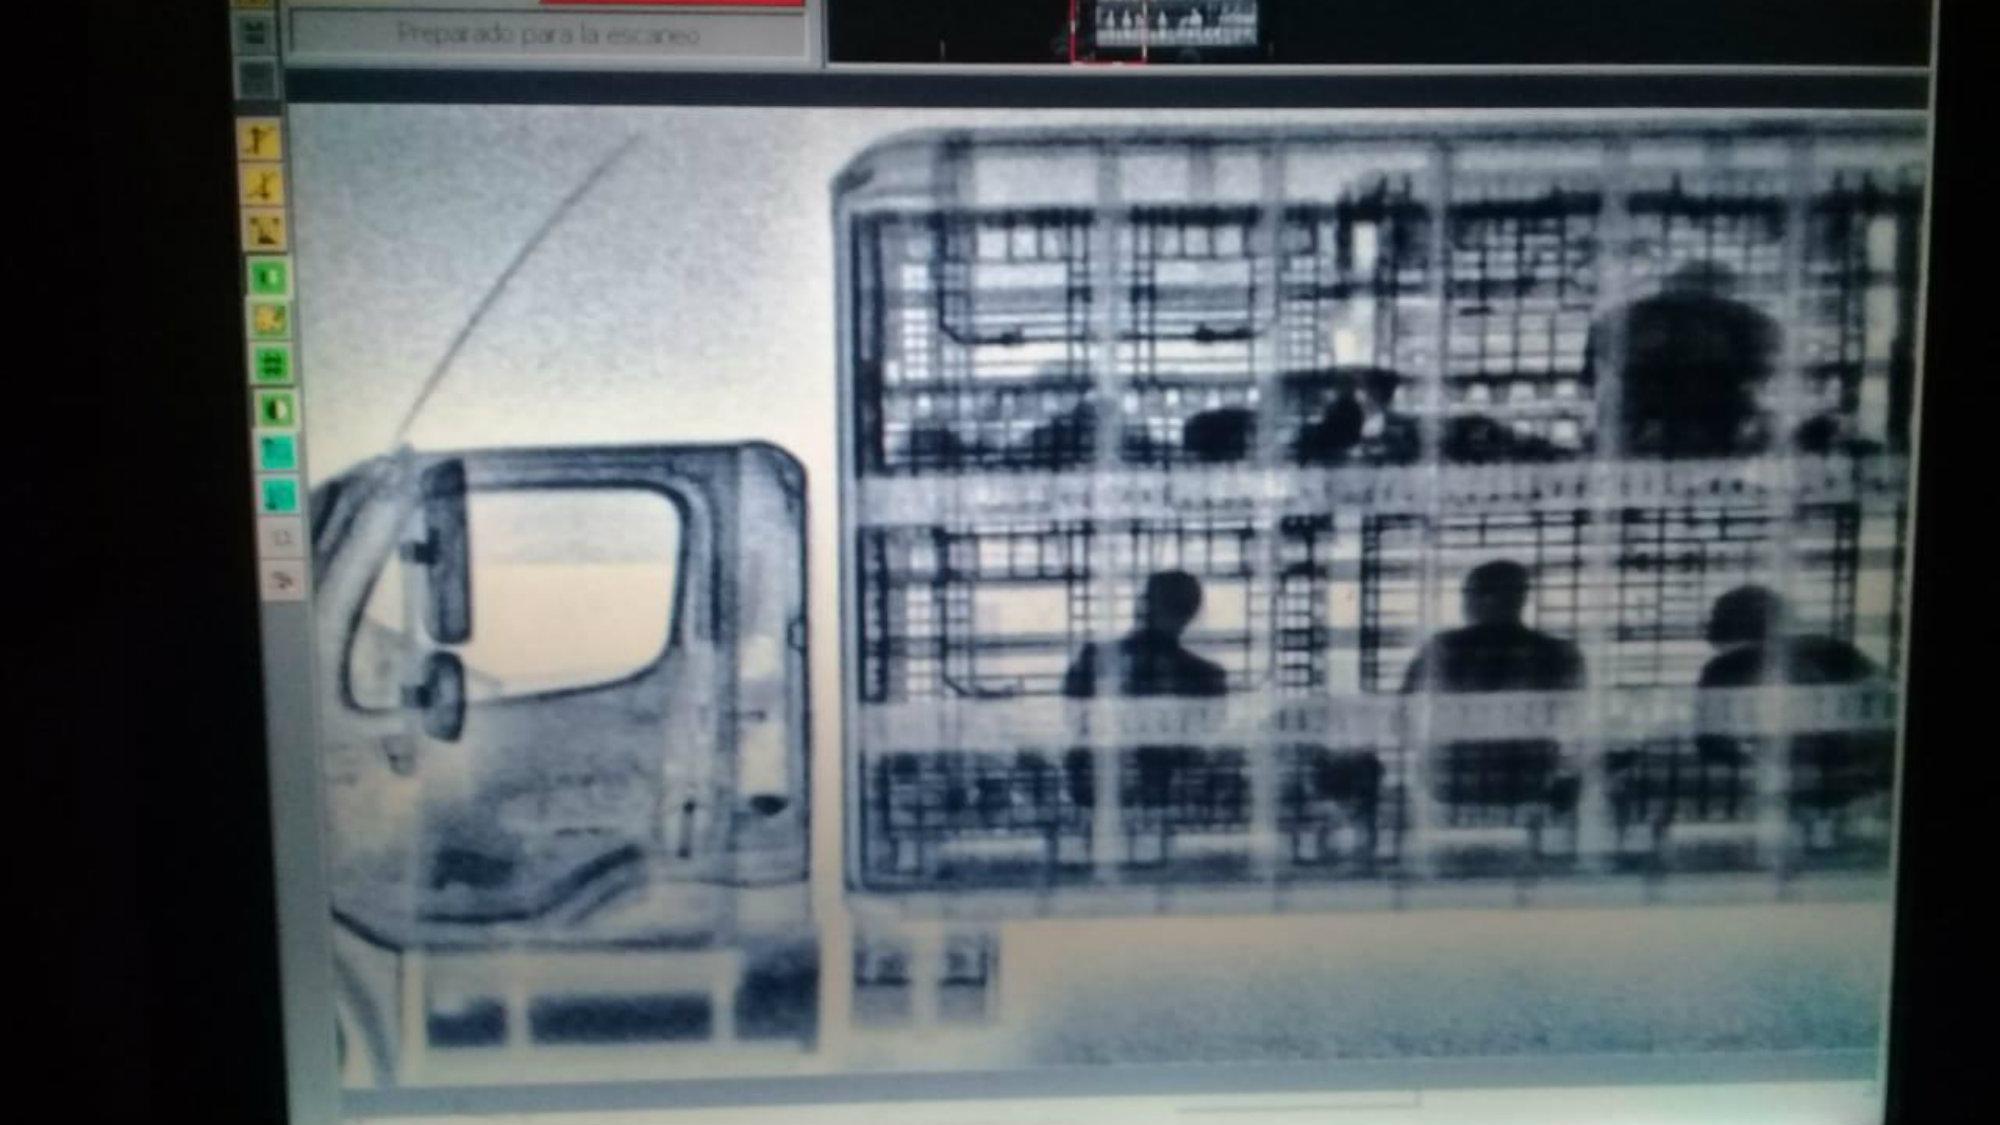 Liberan a migrantes Zacatecas Rayos X Tractocamión